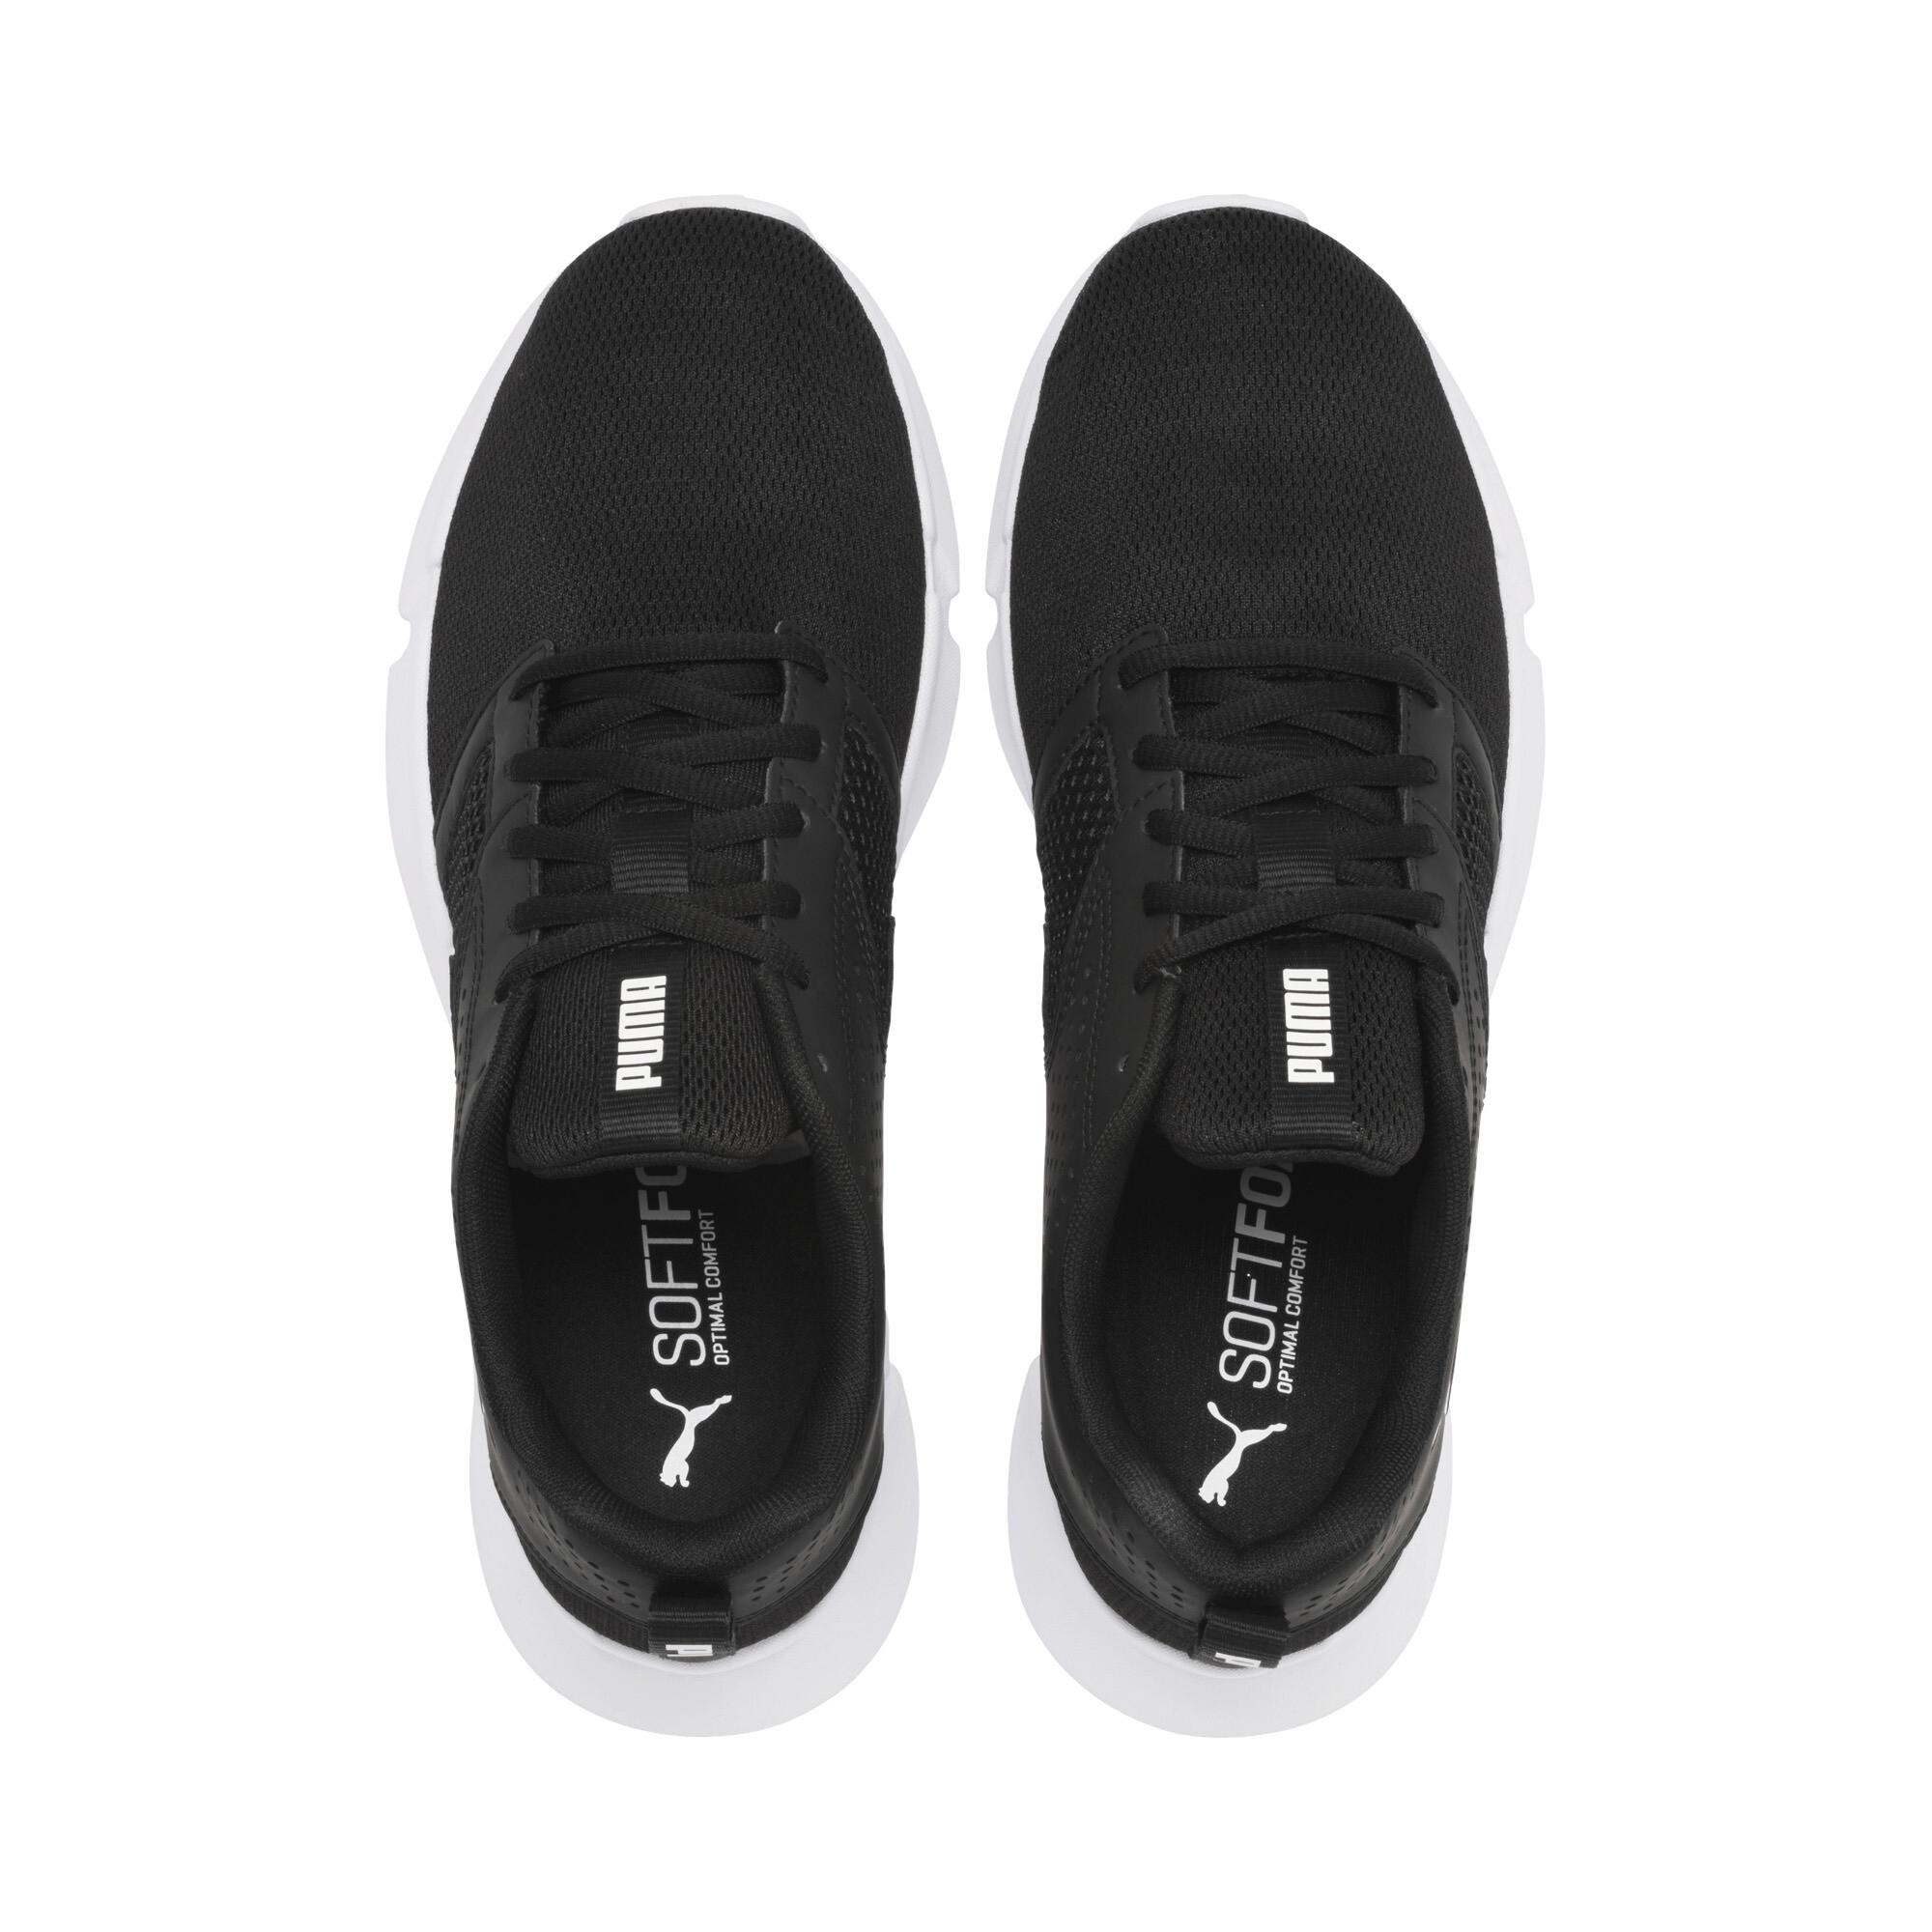 PUMA-INTERFLEX-Modern-Men-039-s-Sneakers-Unisex-Shoe-Running thumbnail 18